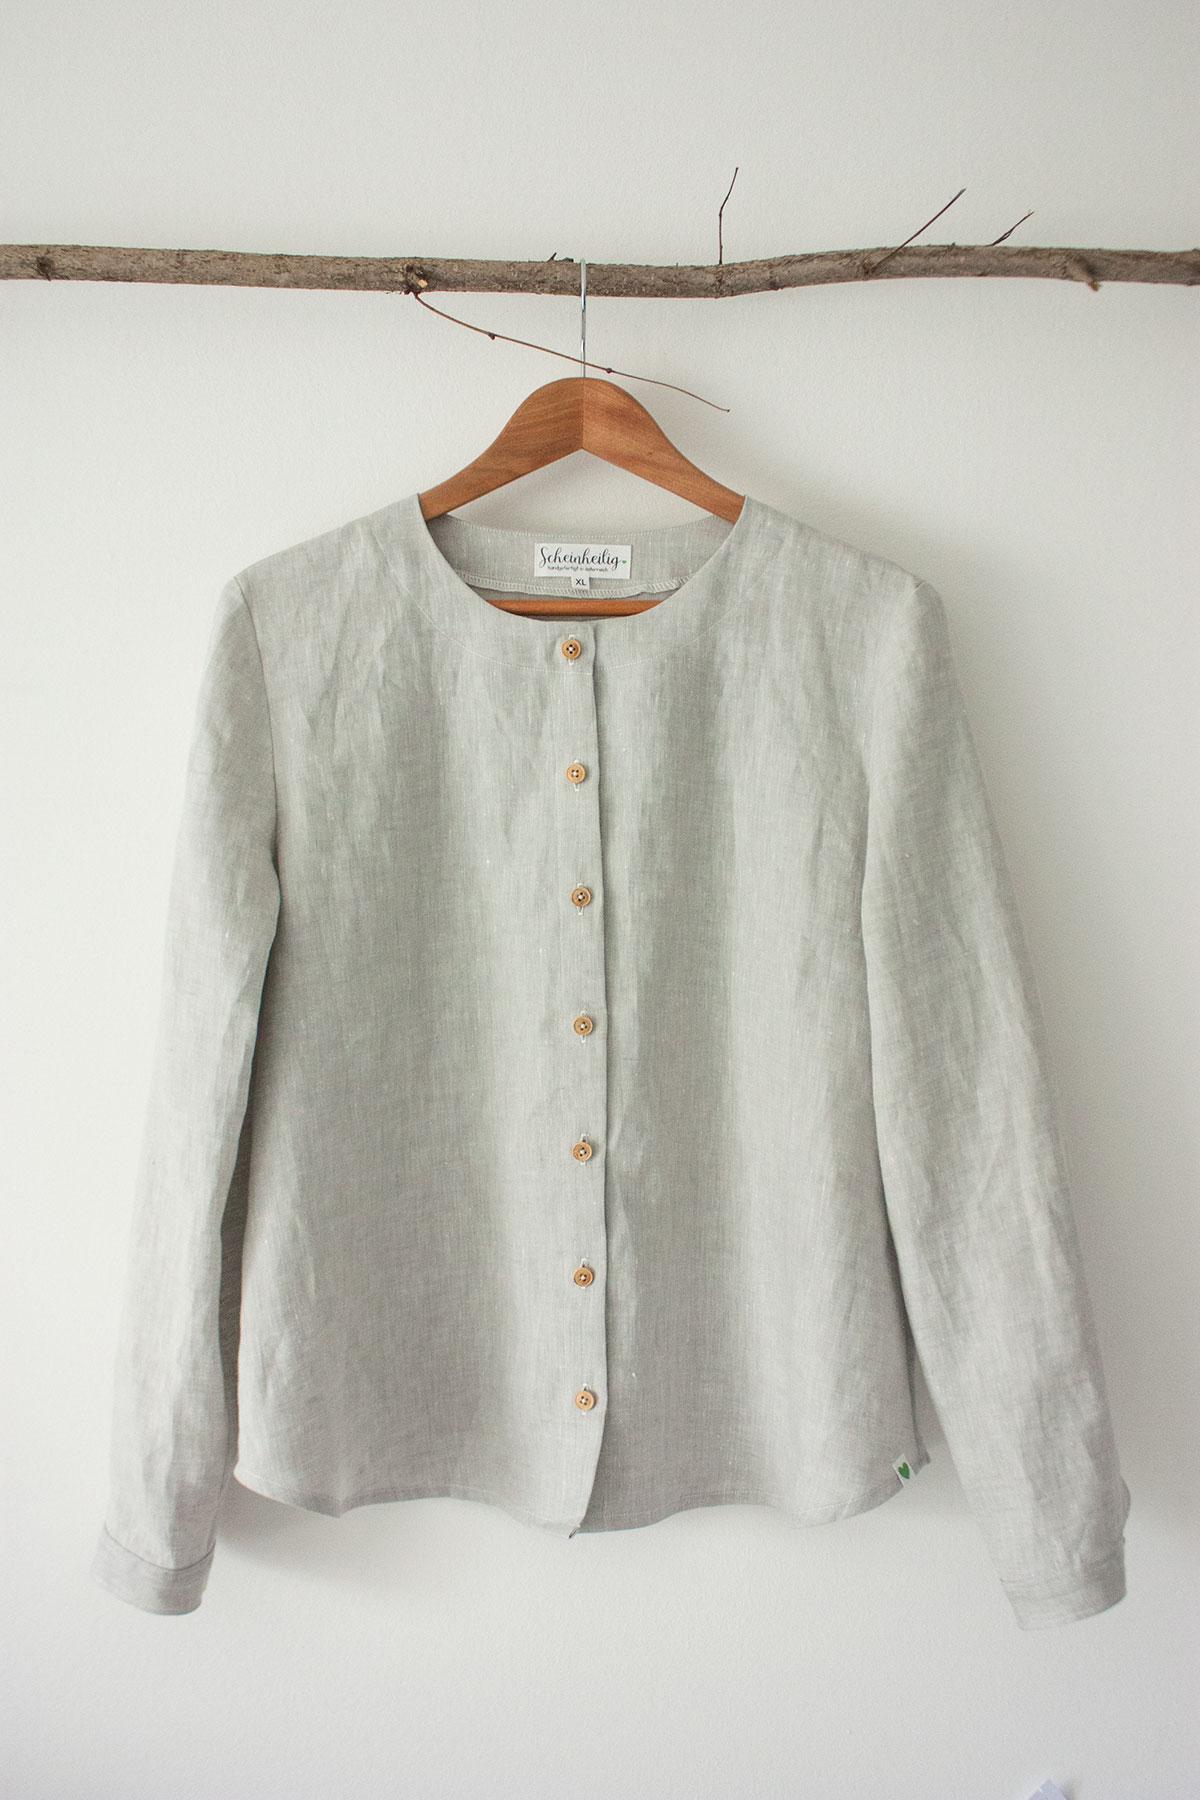 "Damen-Bluse ""Silene"" in grau, aus 100% Bio-Leinen"